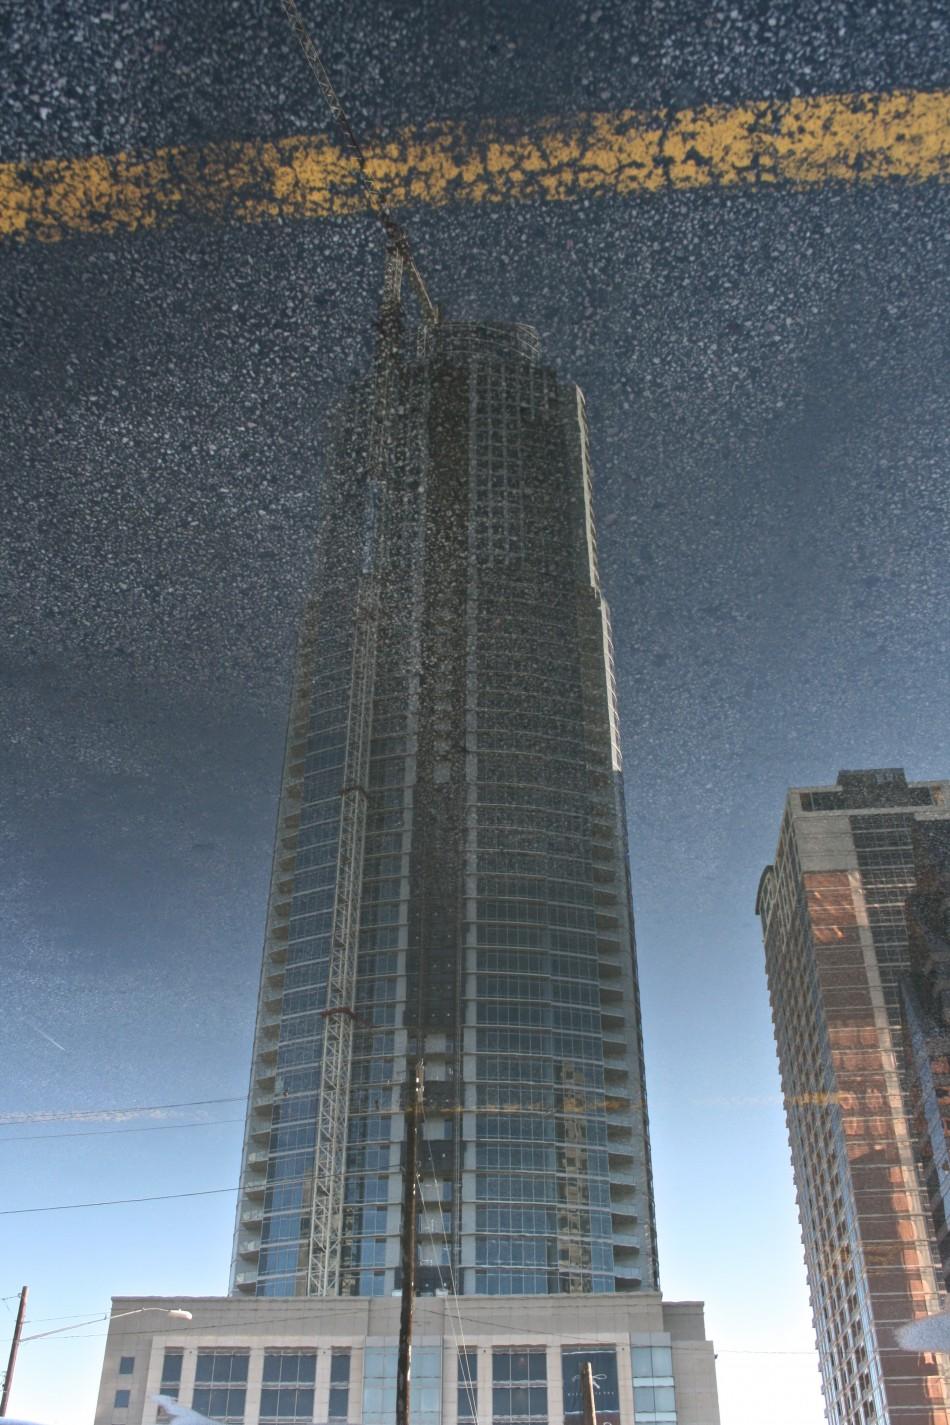 20091213-15-49-36